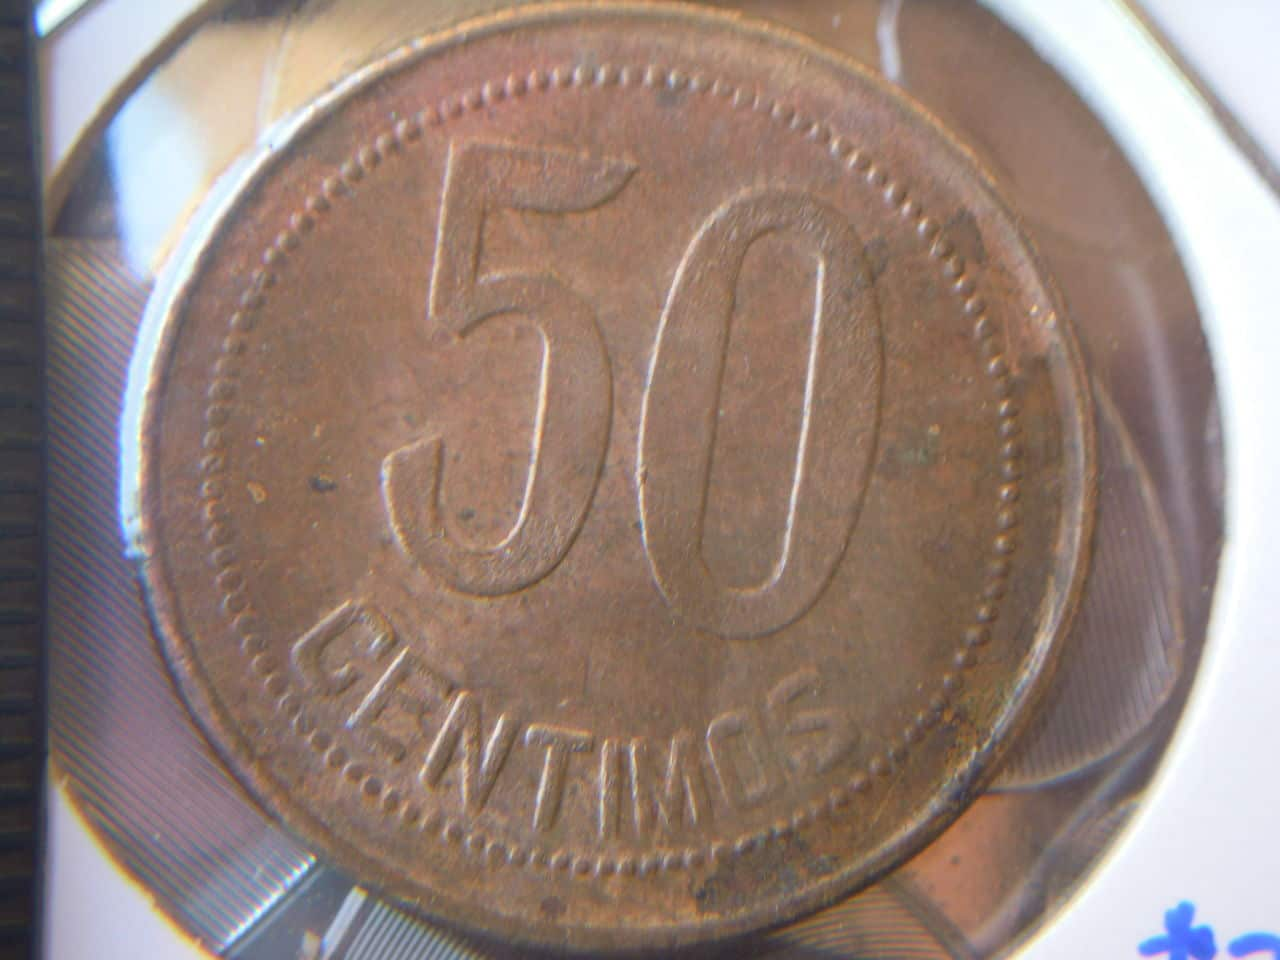 50 Centimos 1937 *34  II Republica - con cual me quedo? 50_centimos_1937_004